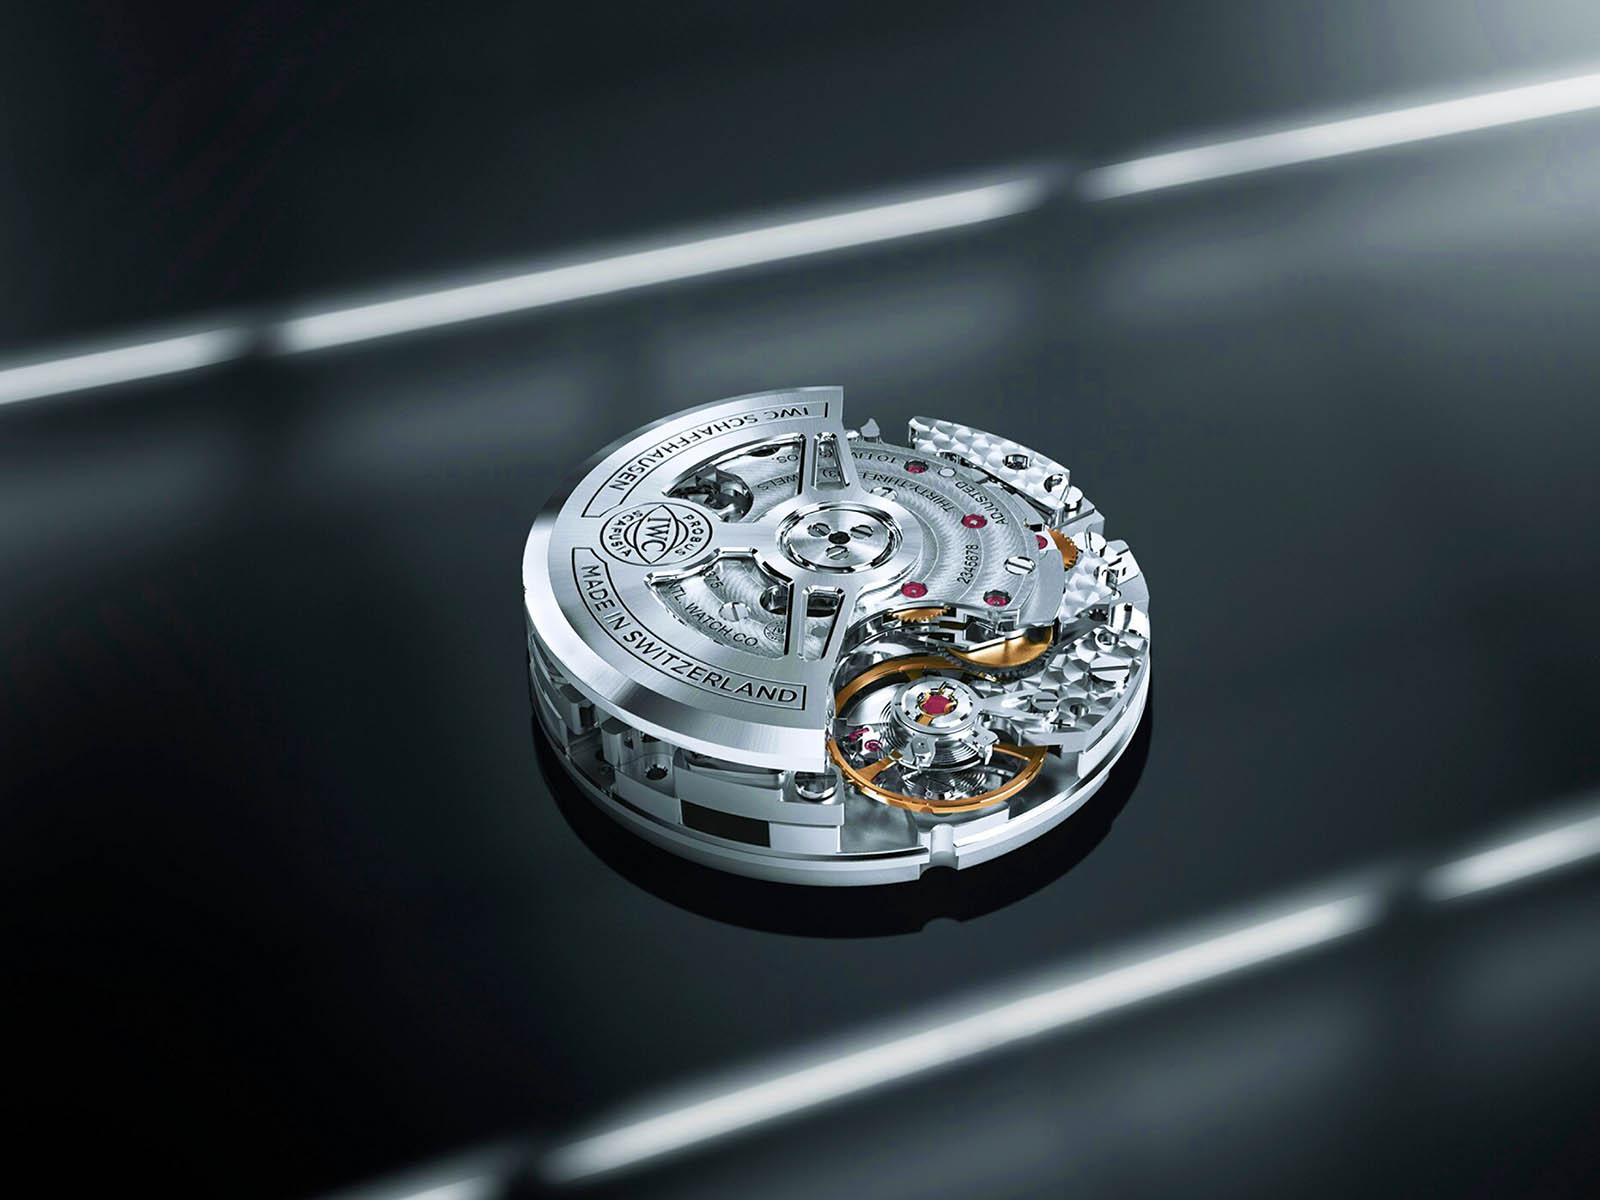 iw387905-iwc-pilot-s-chronograph-tribute-to-3705-7.jpg